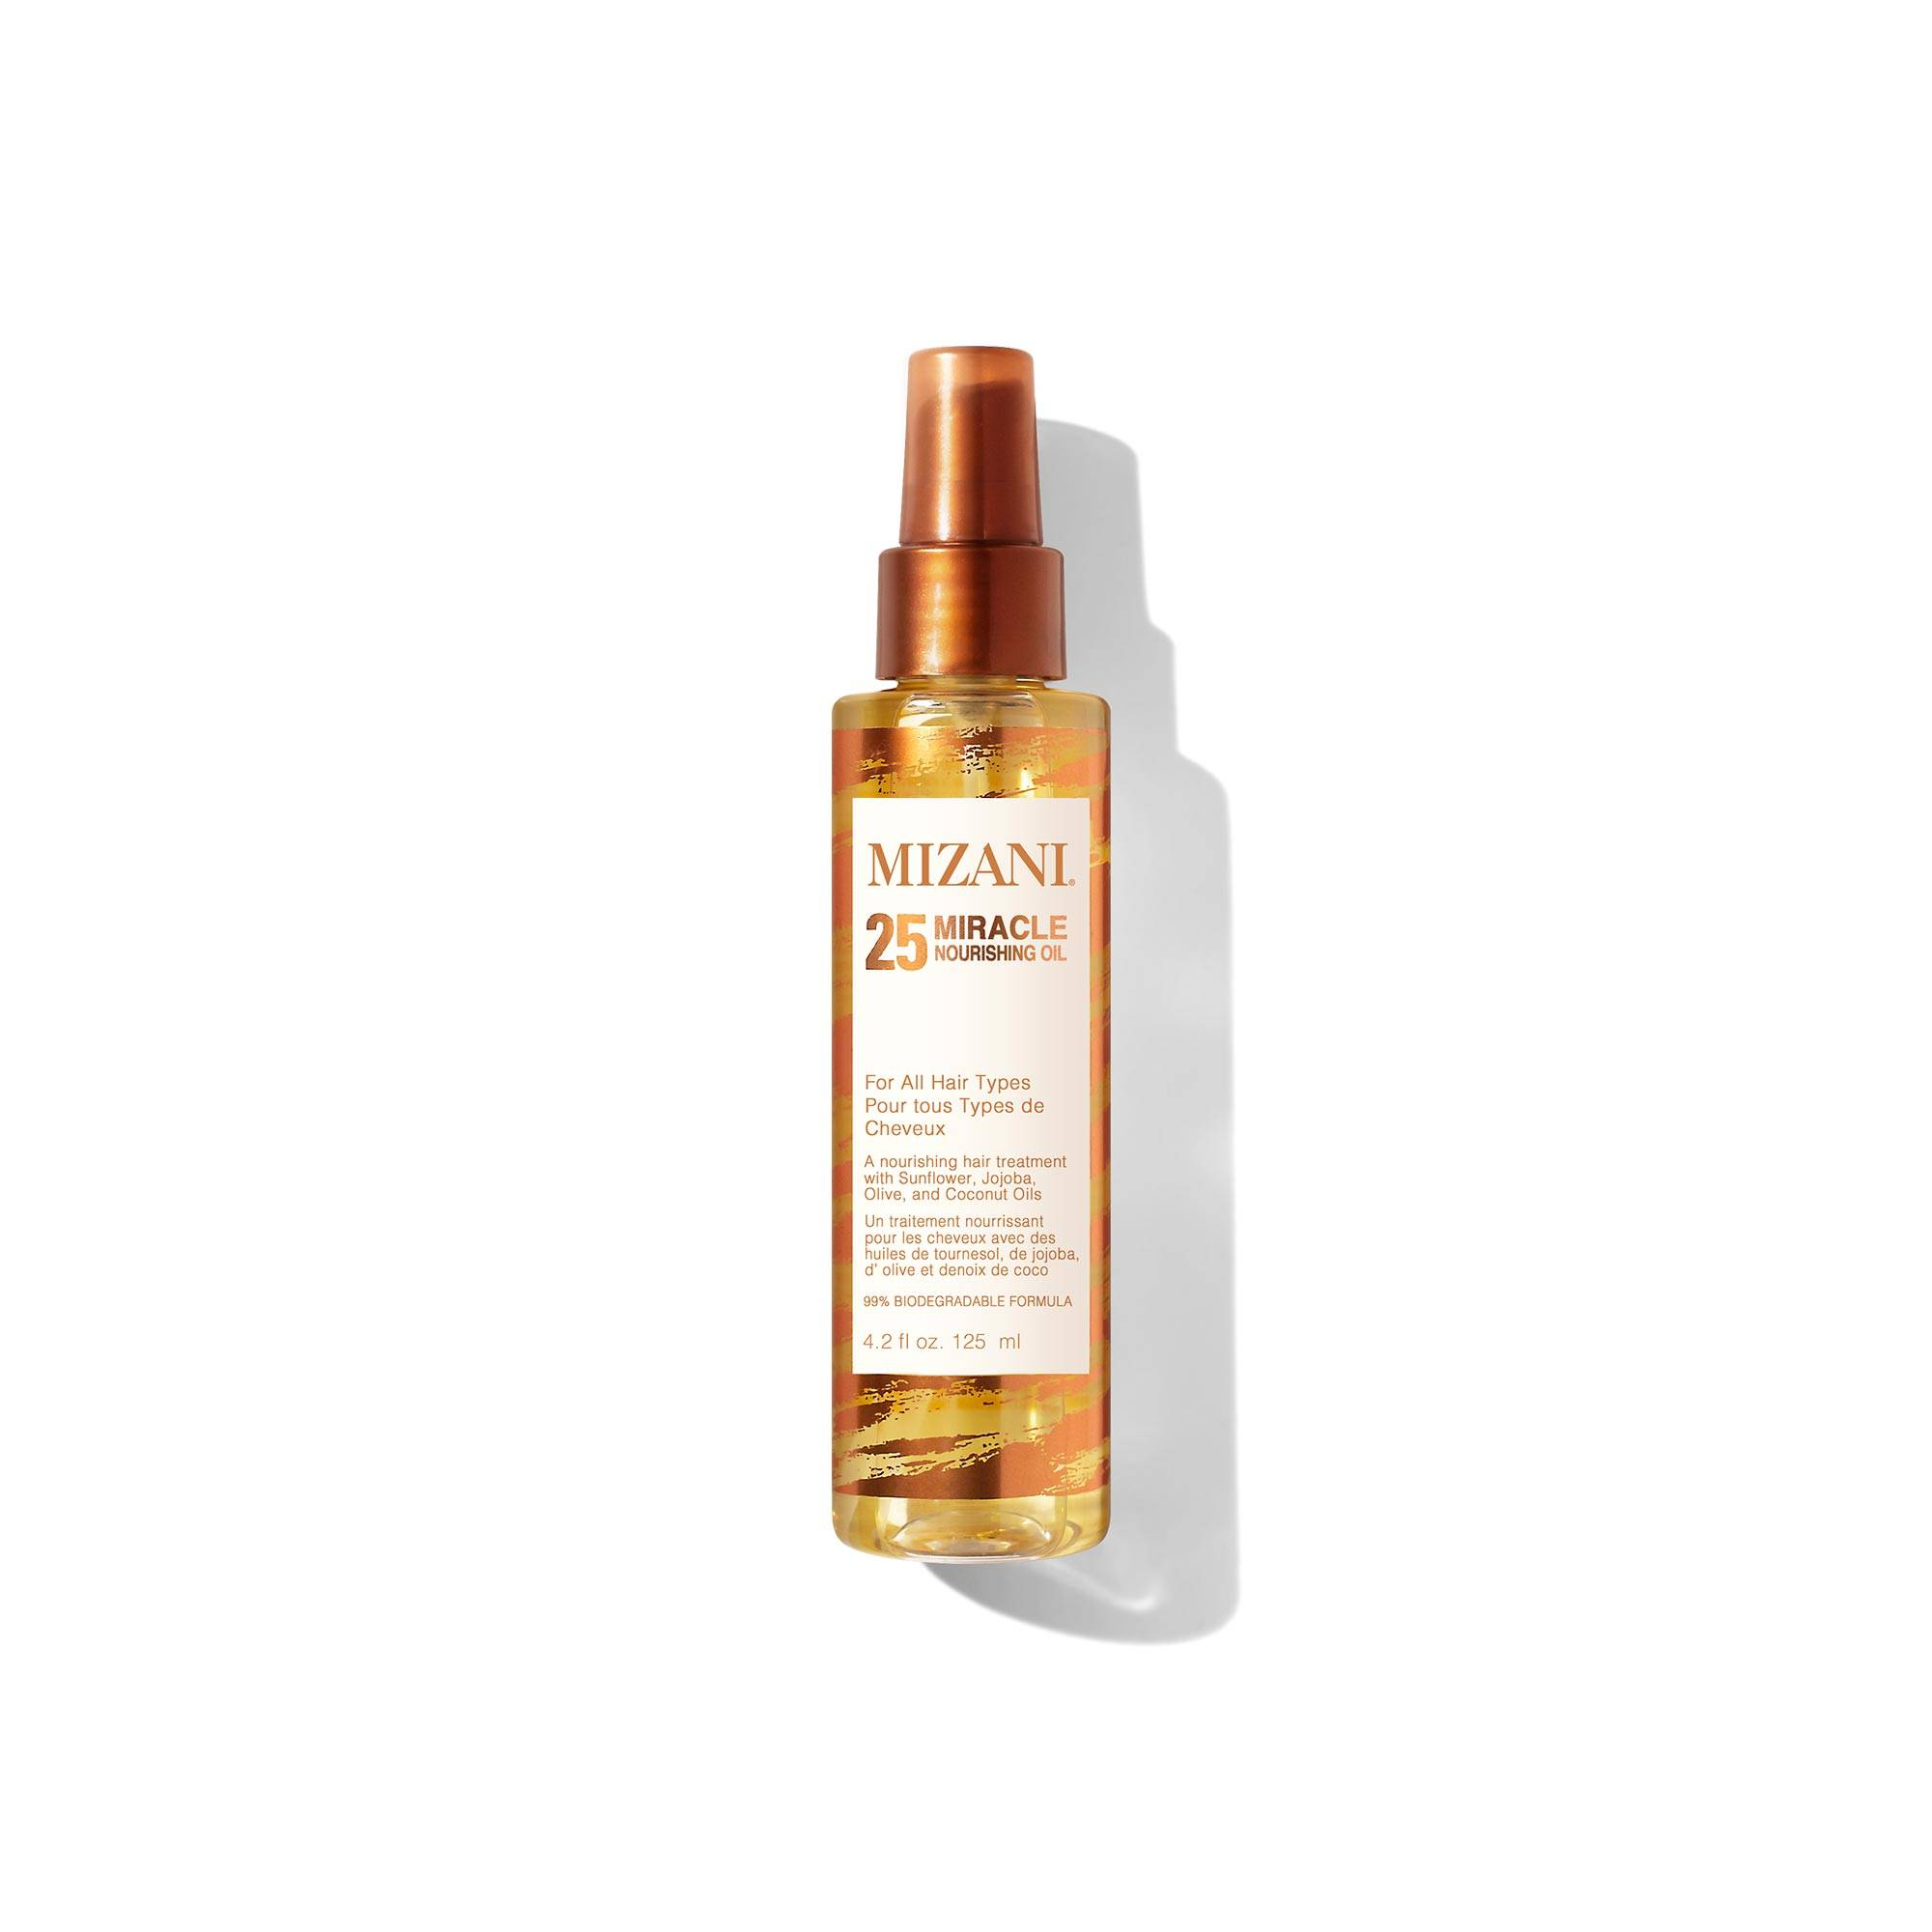 25 Miracle Oil | Mizani | retailbox.co.za